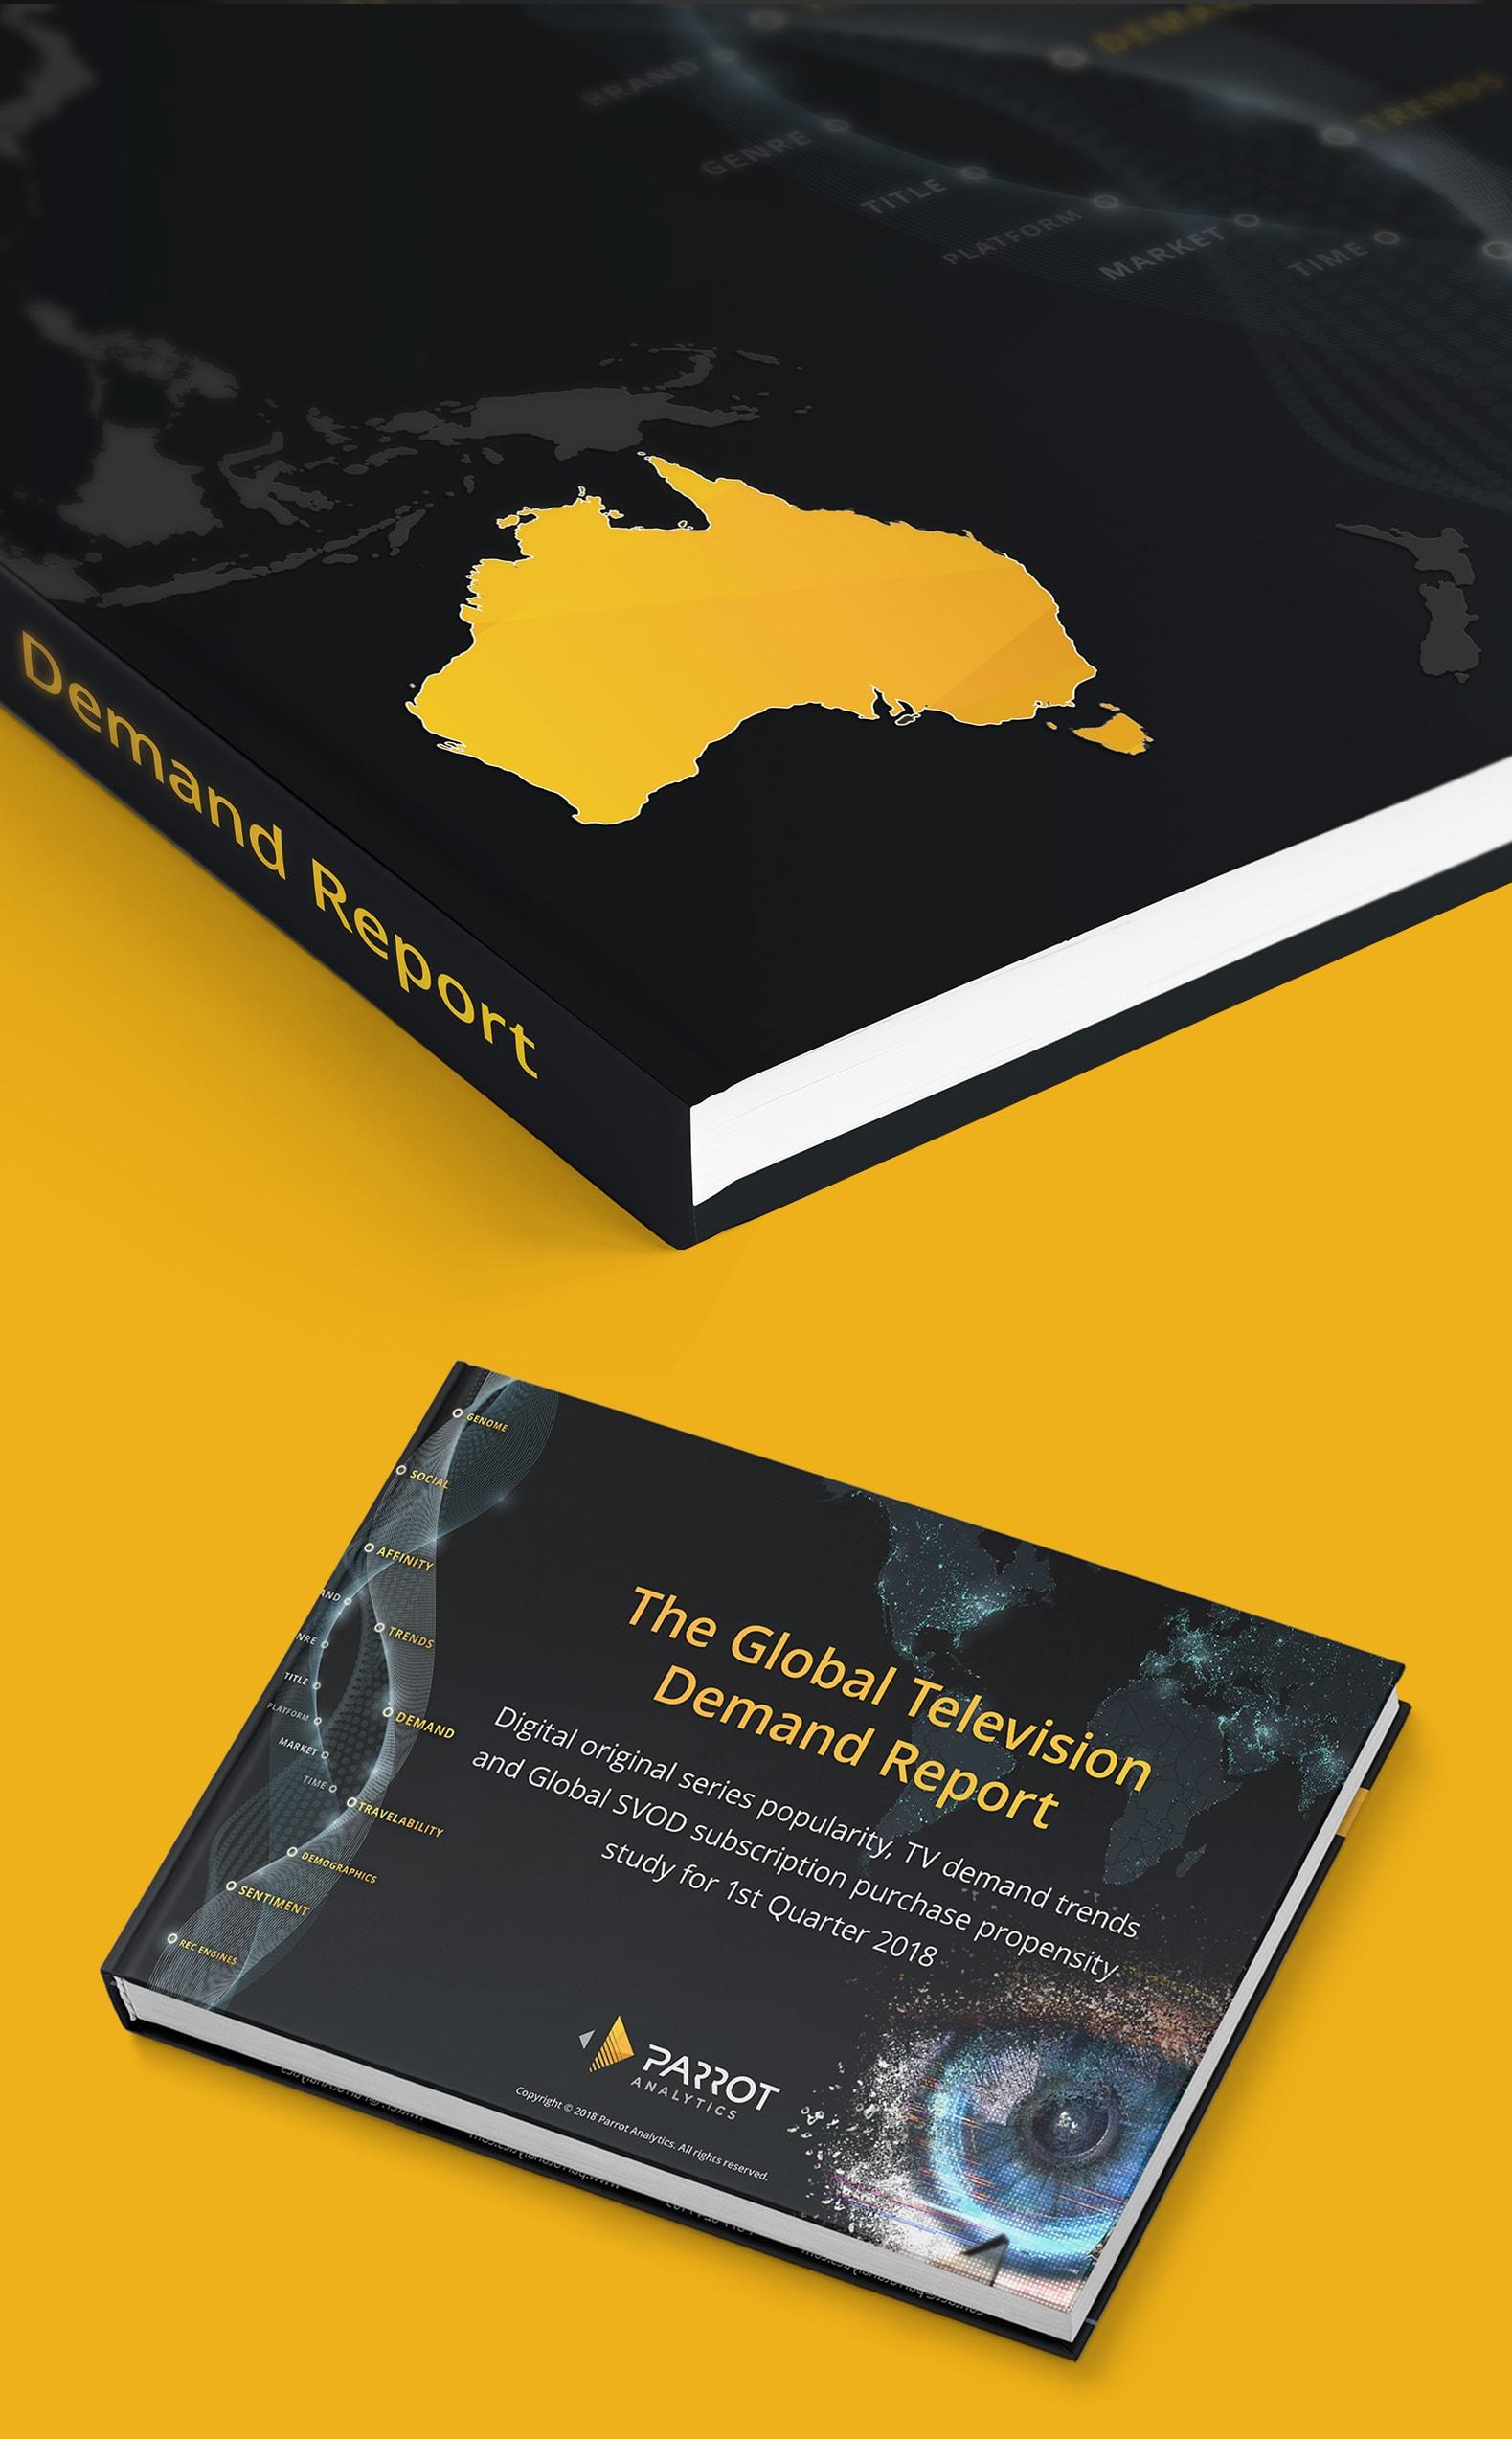 Australia Television Report: SVOD Demand and OTT Trends